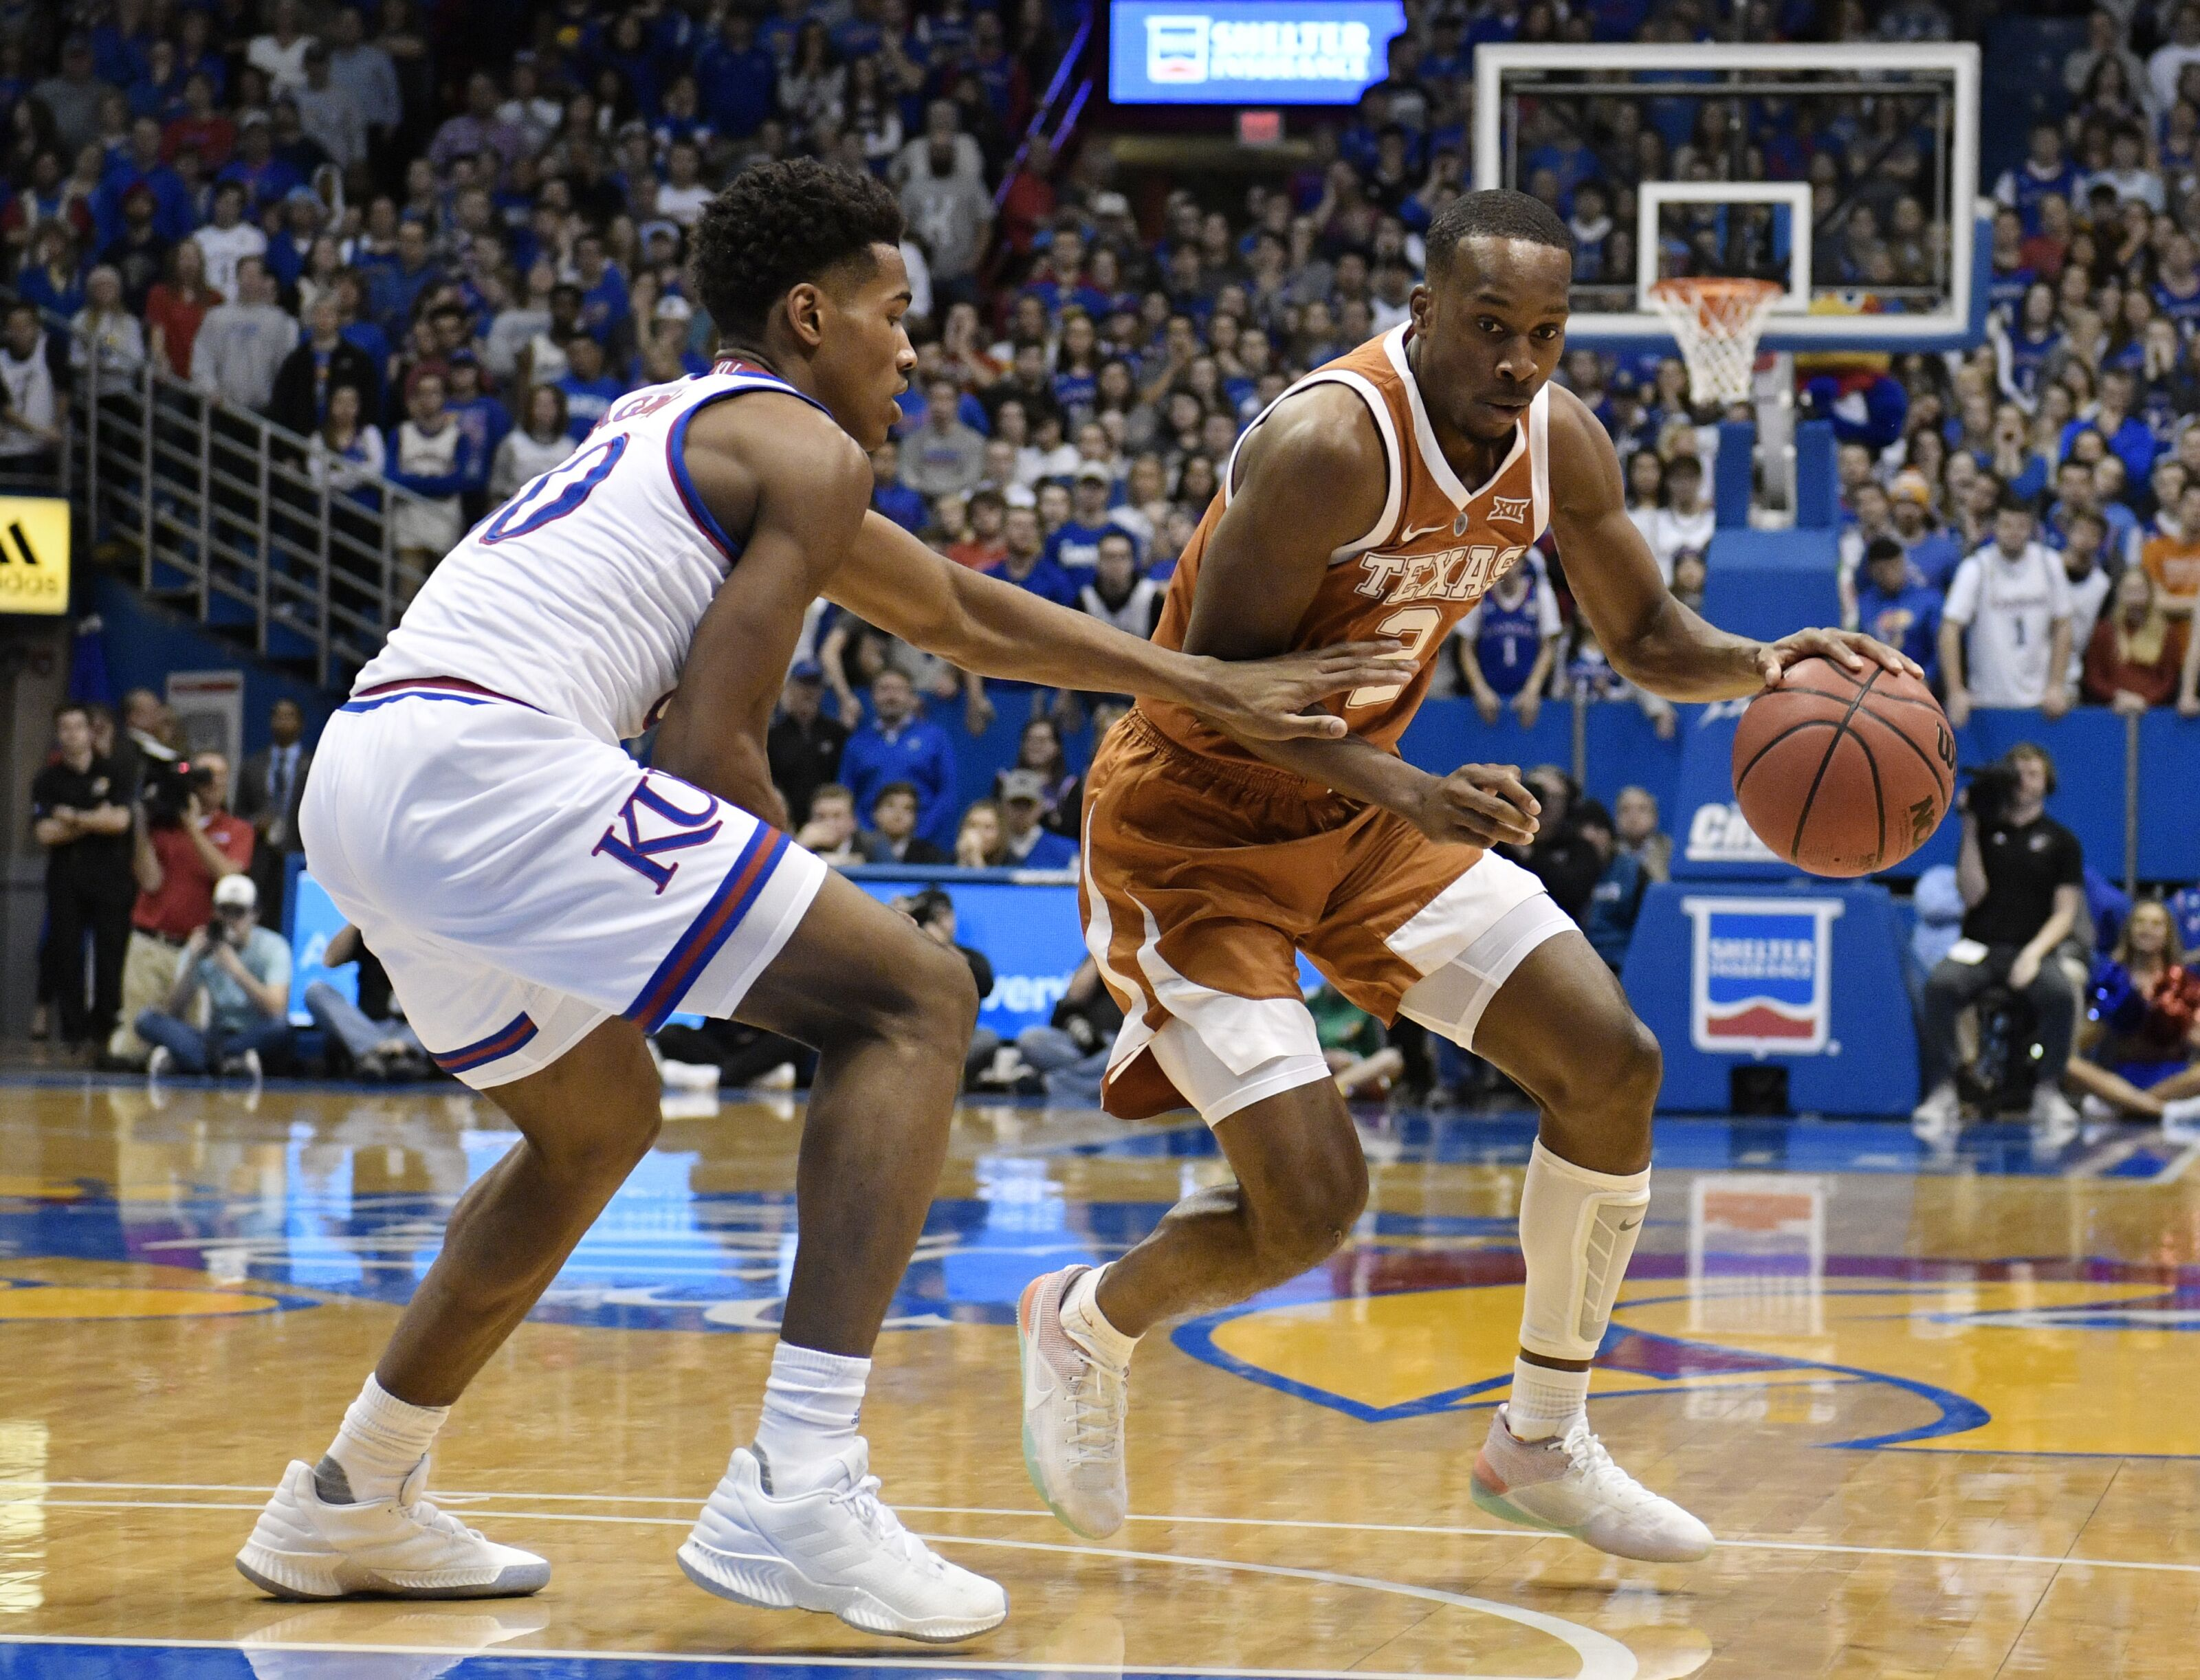 Texas Basketball: Can Longhorns continue KU's downslide?